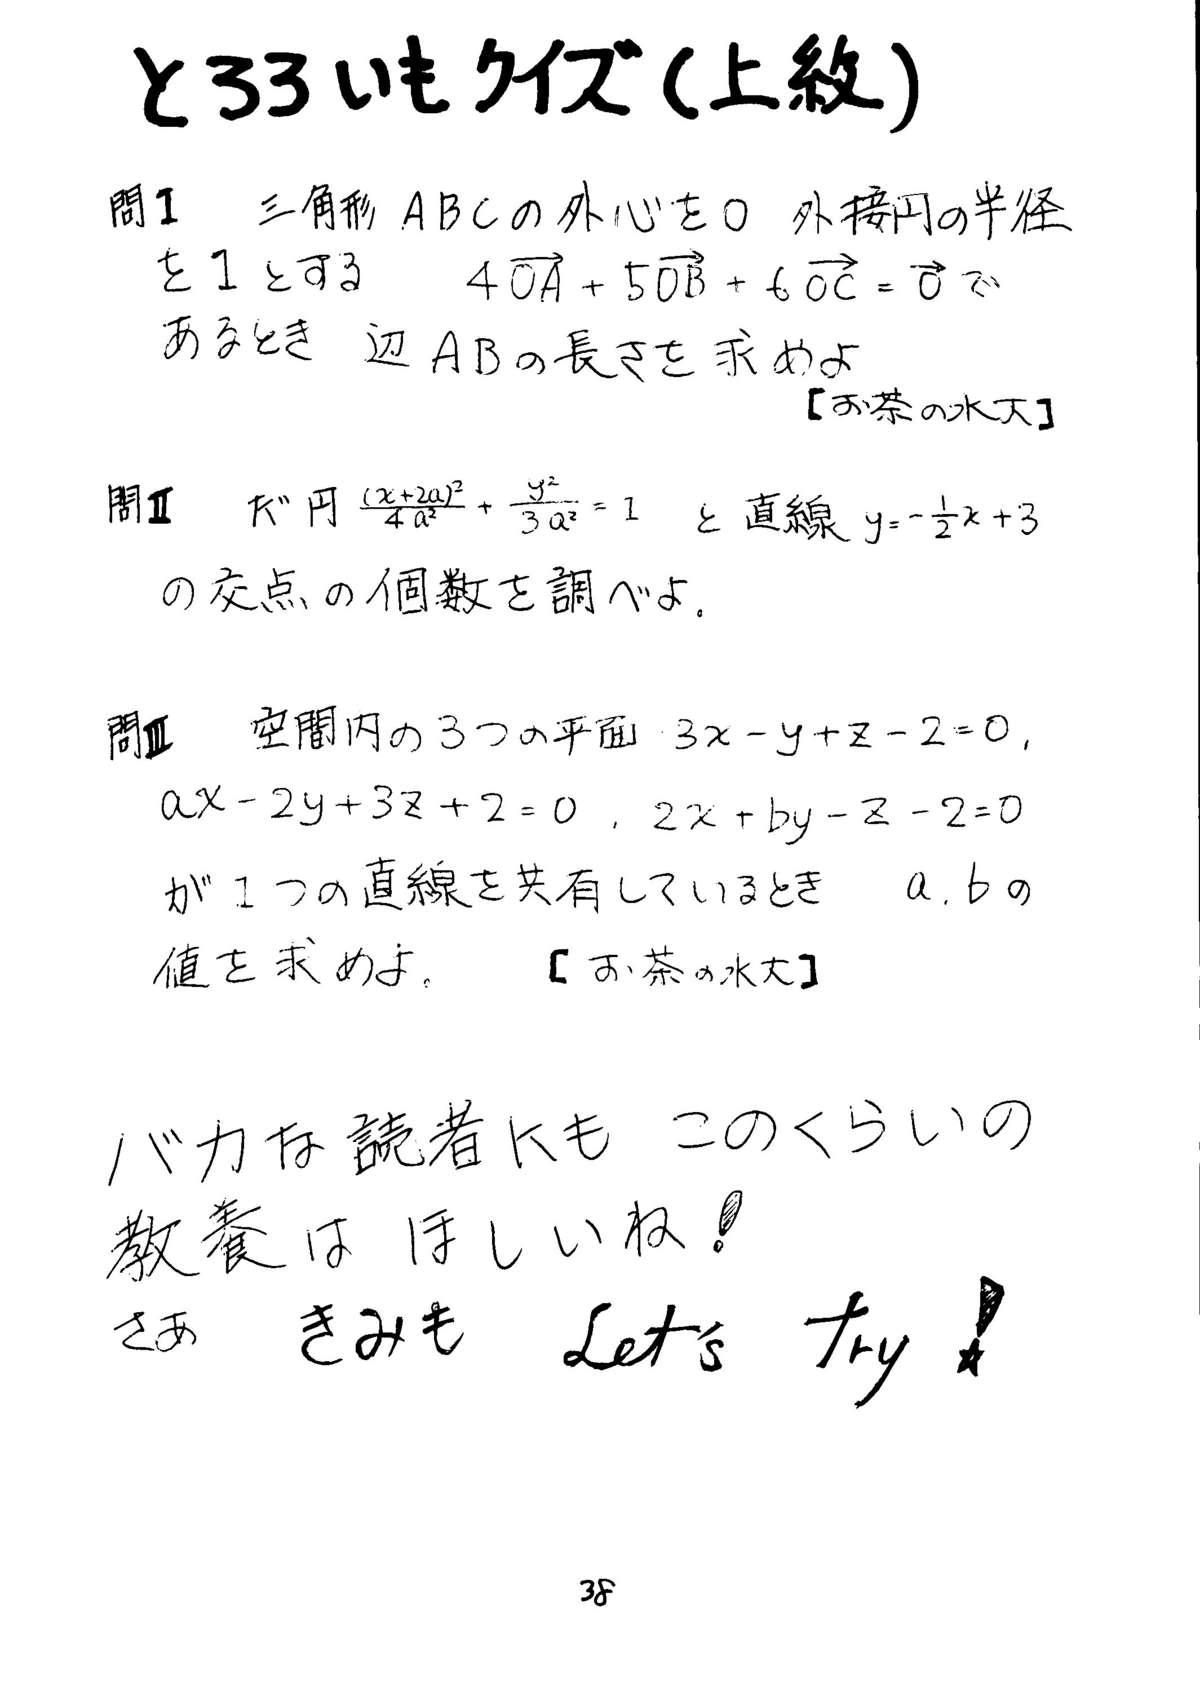 Tororoimo Vol. 5 36